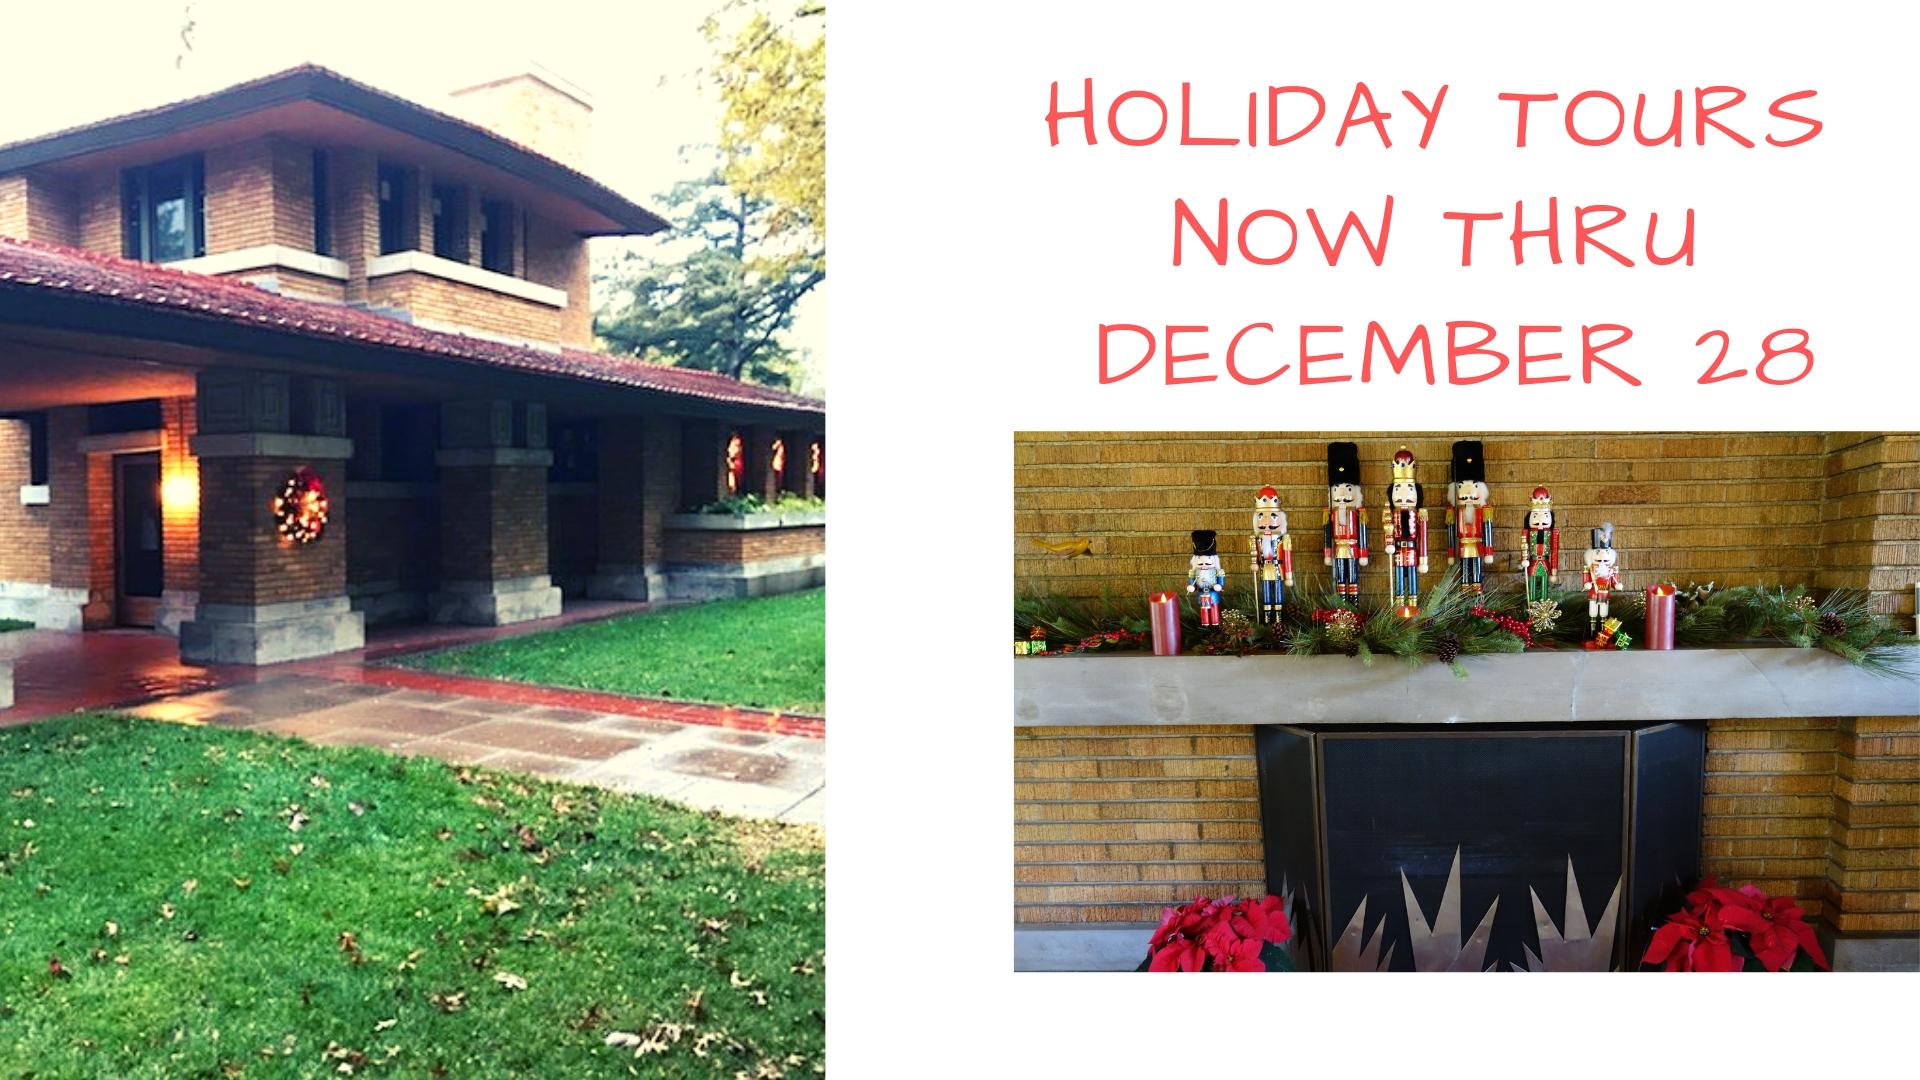 Holiday-Tours-now-thru-December-28